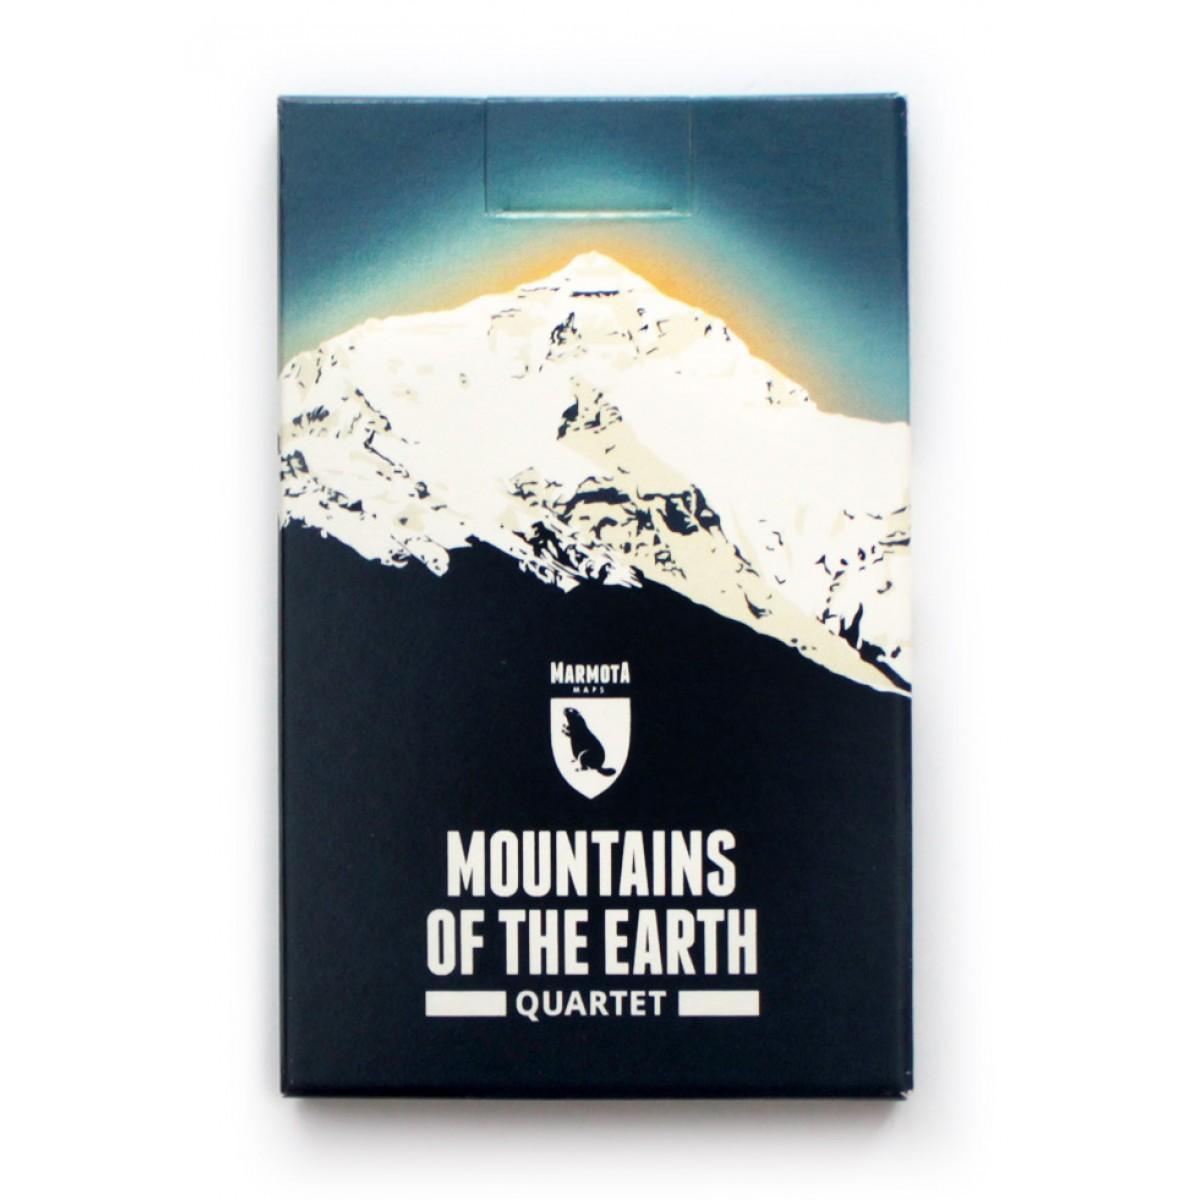 Marmota Maps – Mountains of the Earth Quartett